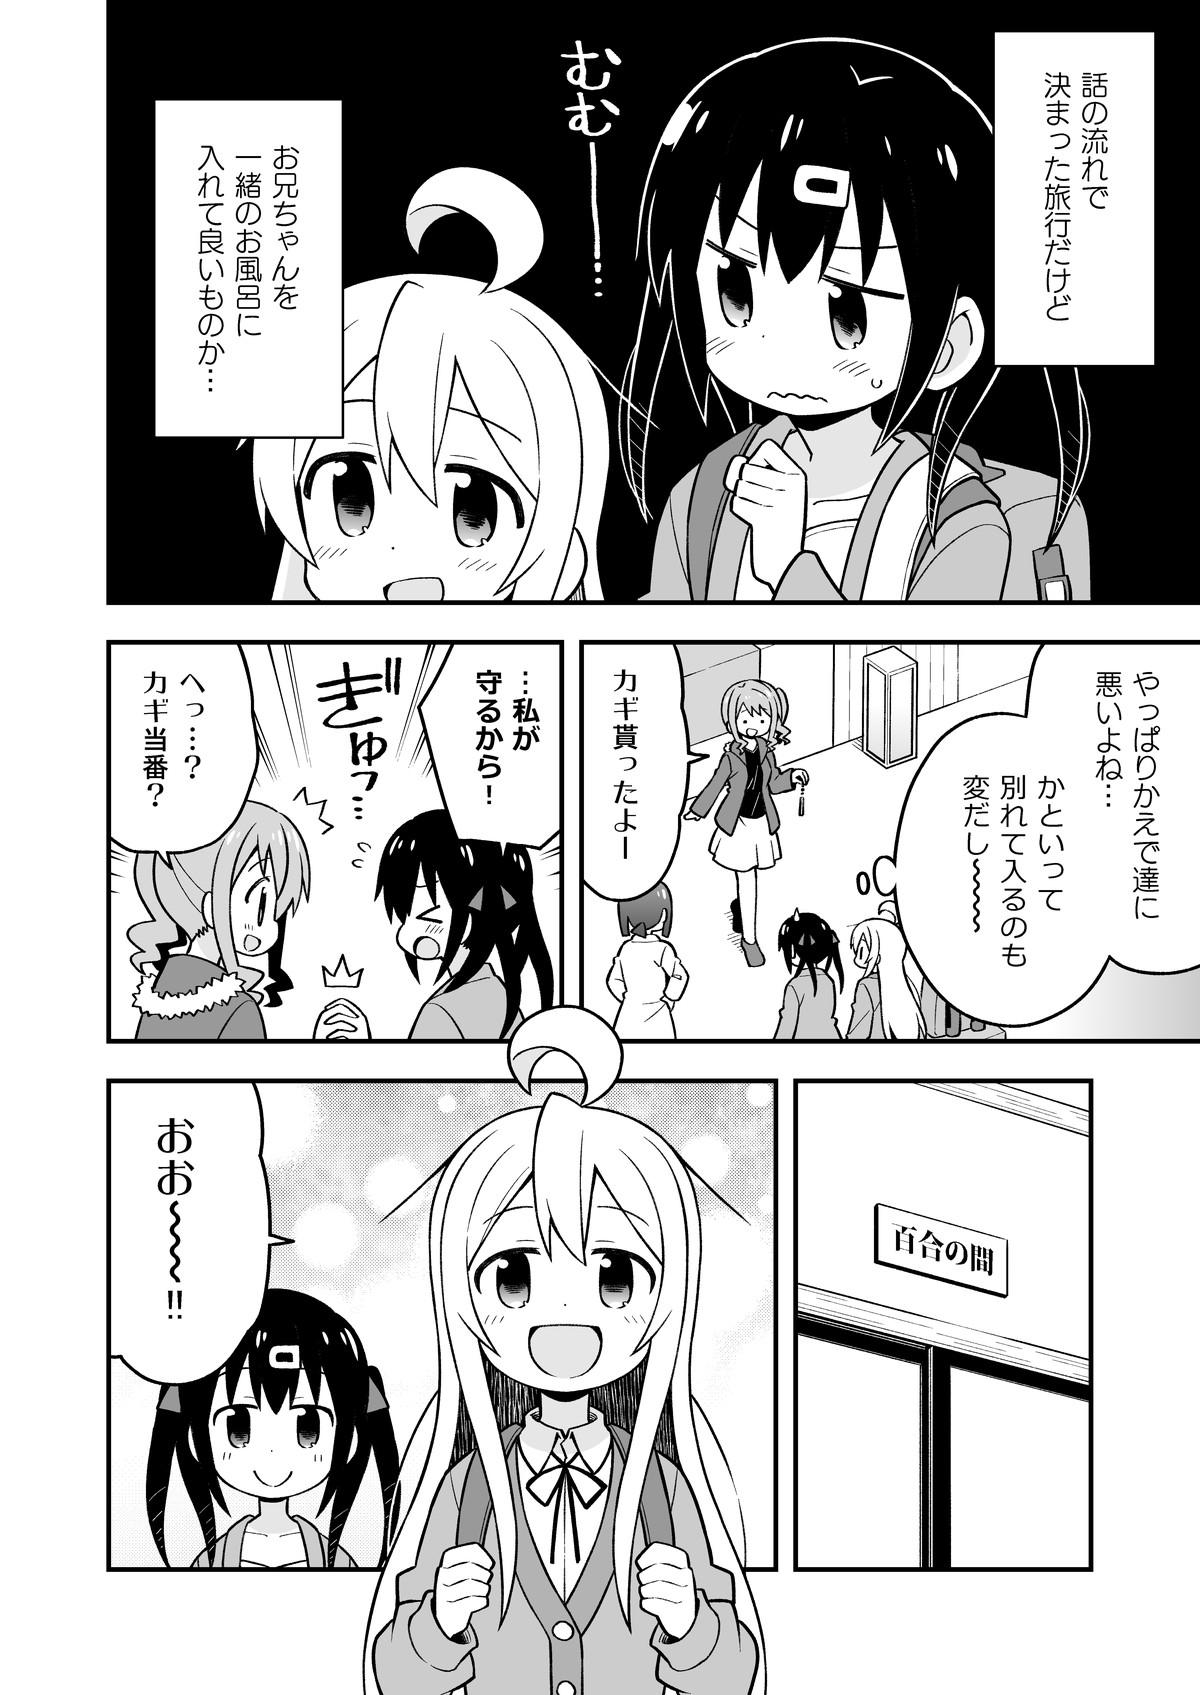 Onii-chan wa Oshimai! 6 16